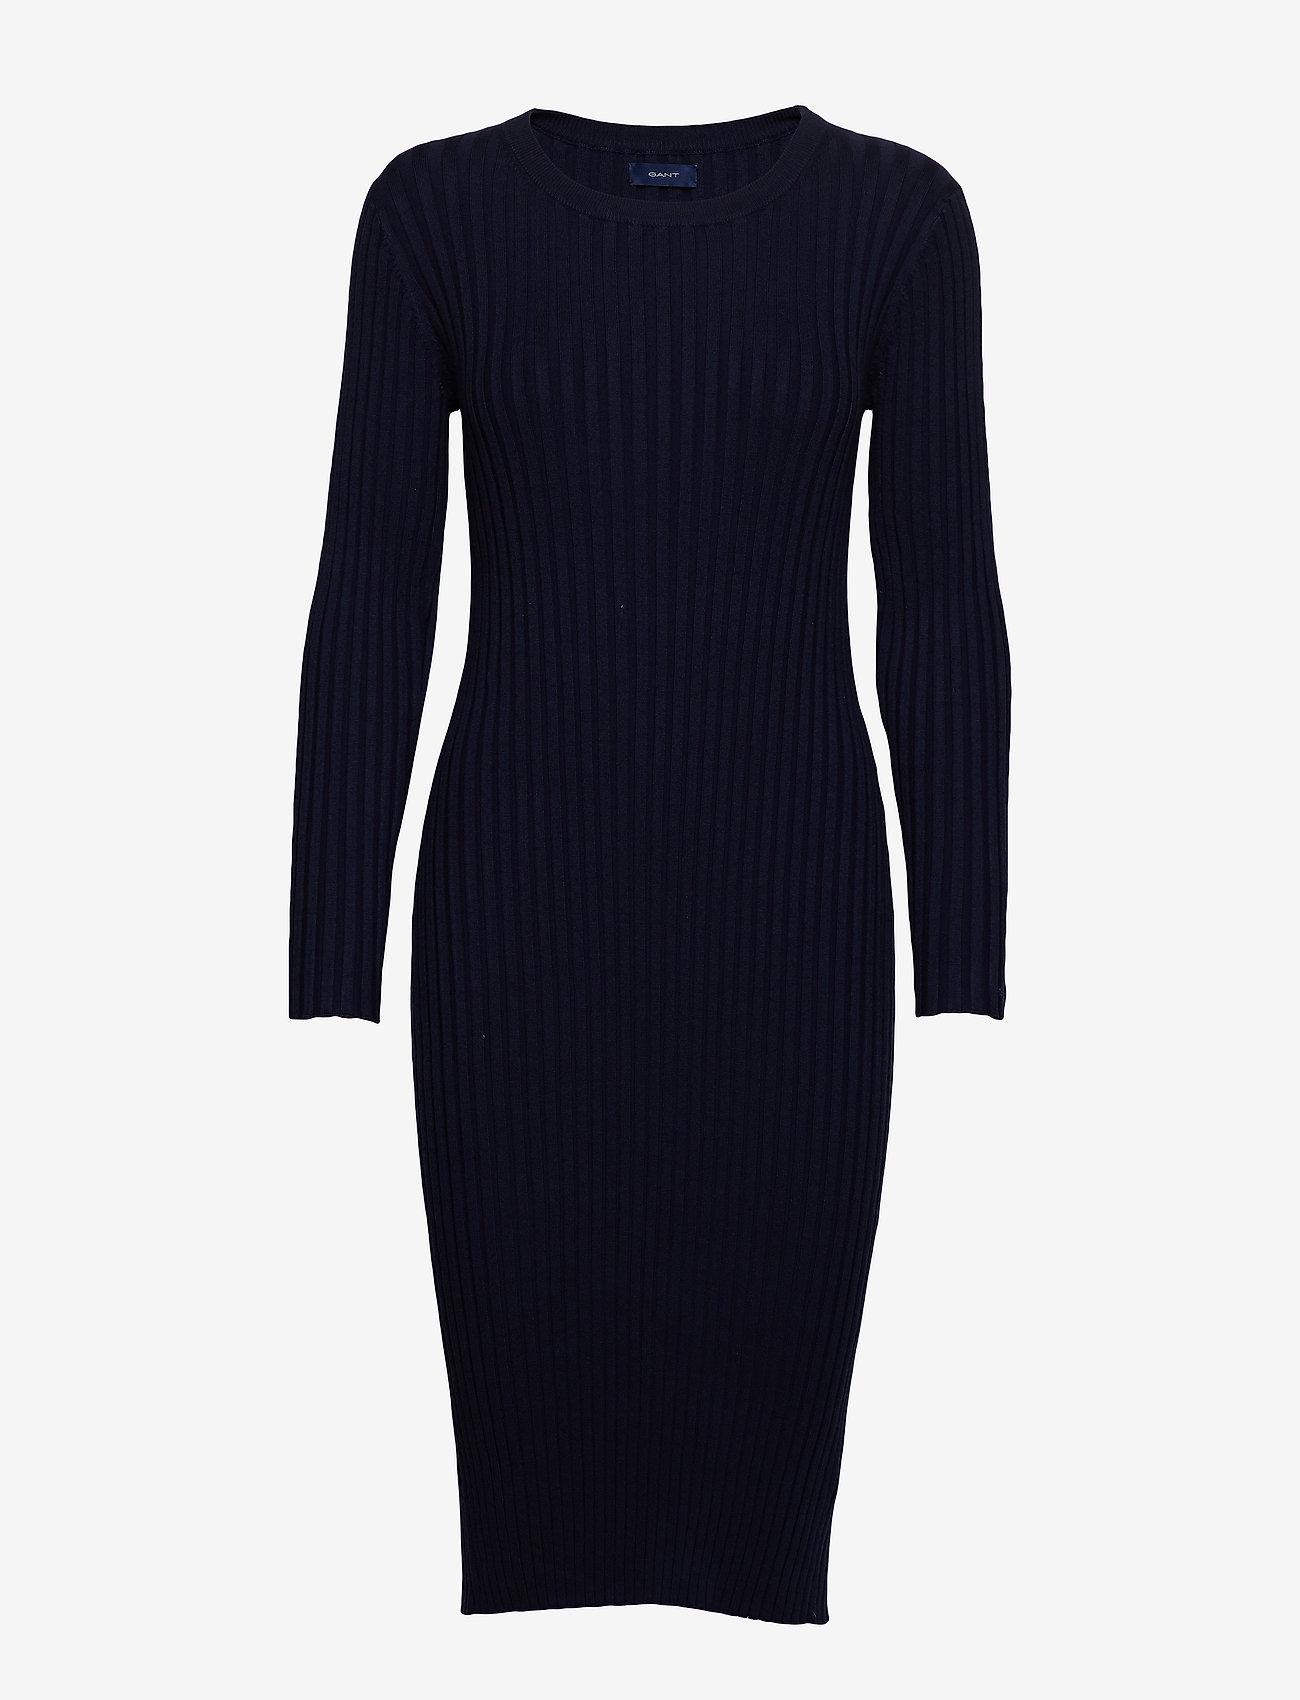 Gant - D1. RIB KNITTED DRESS - midimekot - evening blue